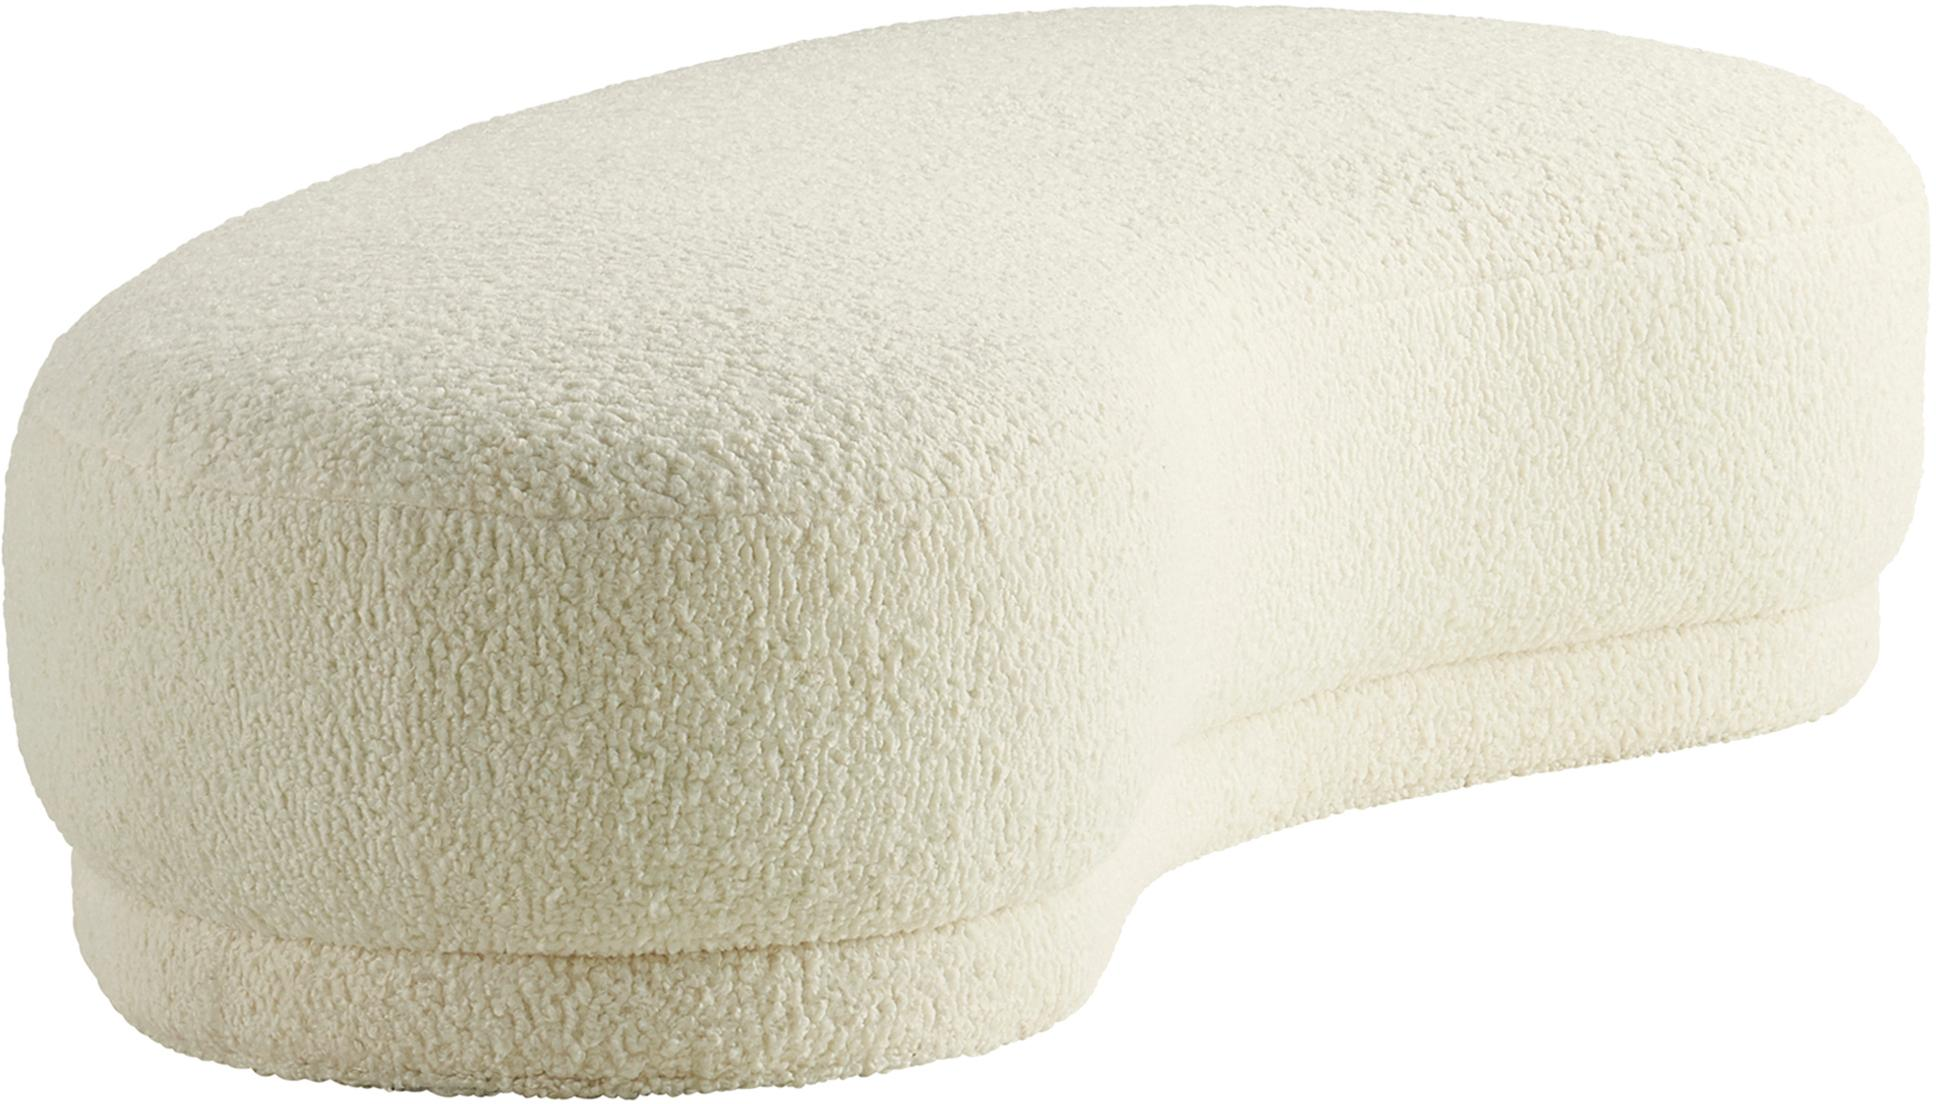 Teddy-Sitzbank Austin, Bezug: Polyester (Teddy), Gestell: Kiefernholz, Teddy Cremeweiß, 160 x 36 cm